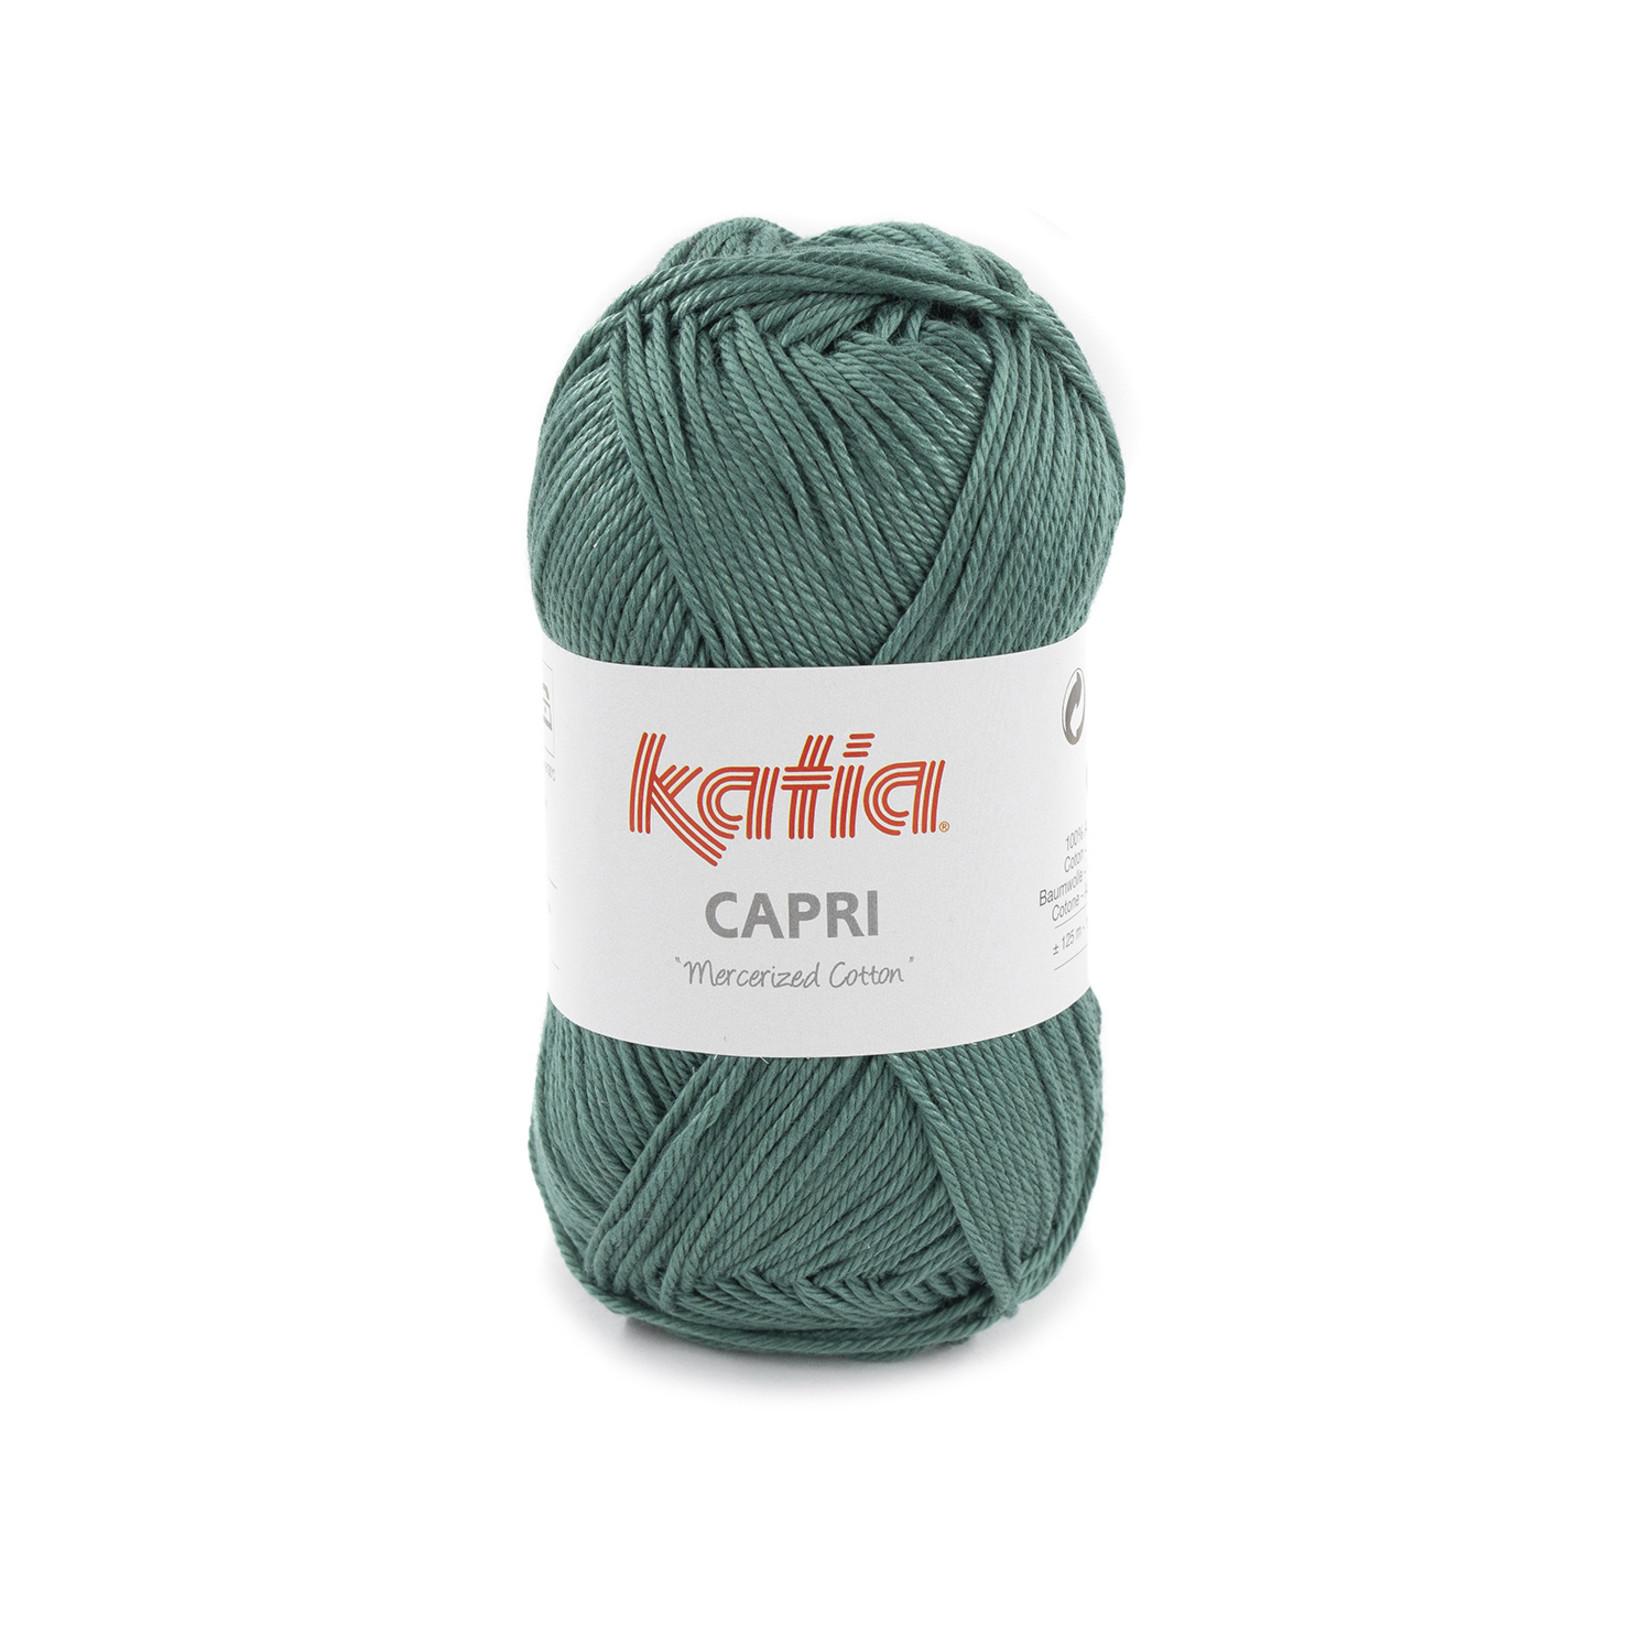 Katia Katia Capri - kleur 179 onbekend - 50 gr. = 125 m. - 100% katoen